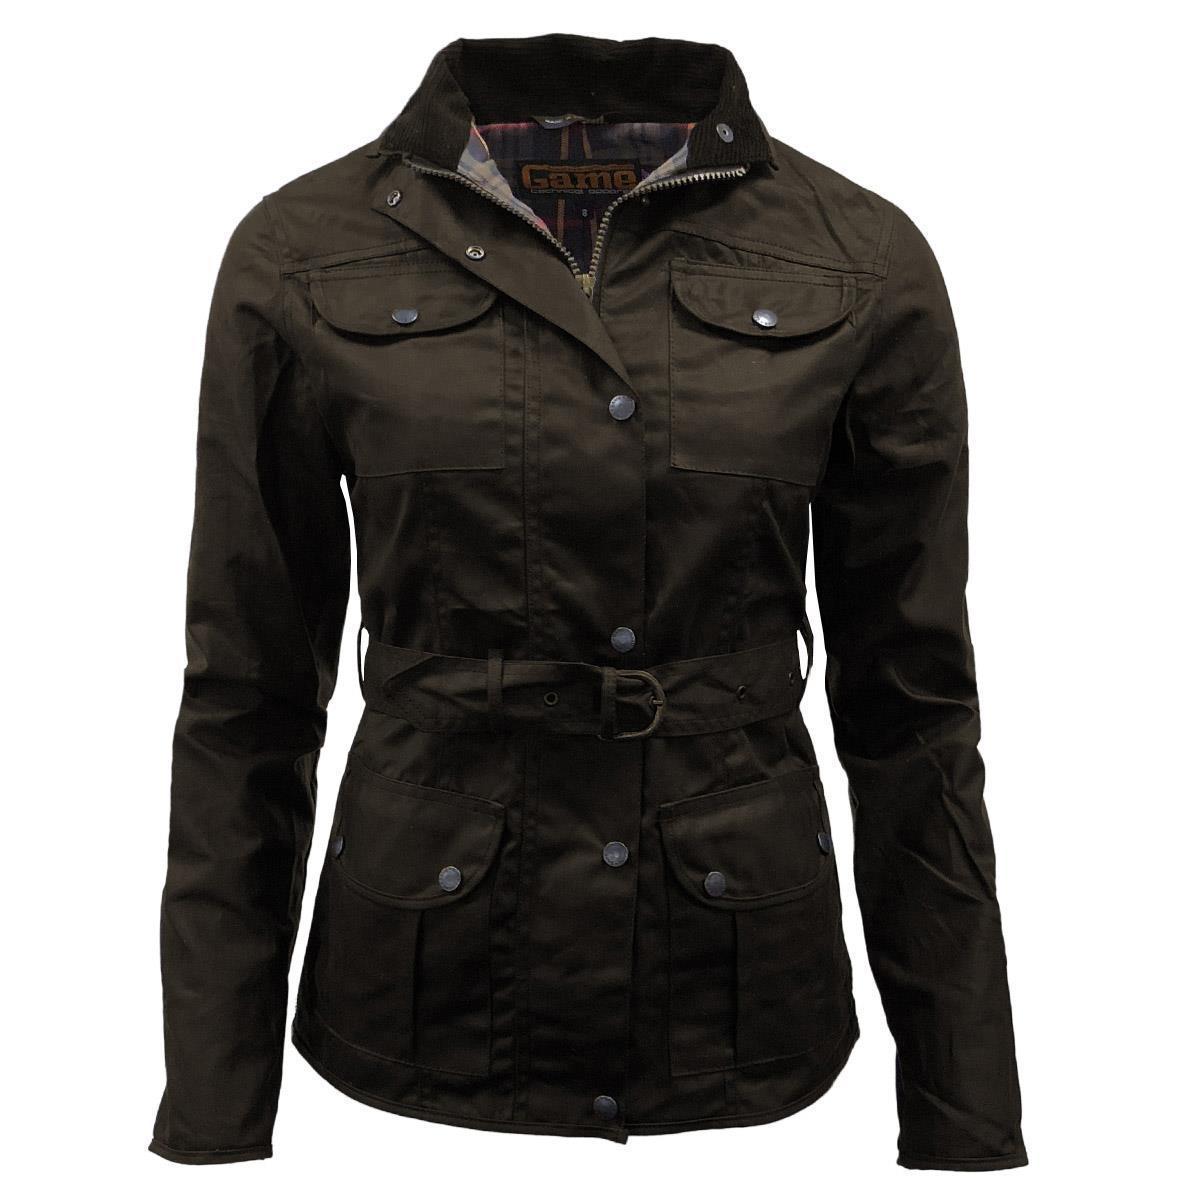 Game Technical Apparel Women's Jacket Morgan Wax - Brown 10